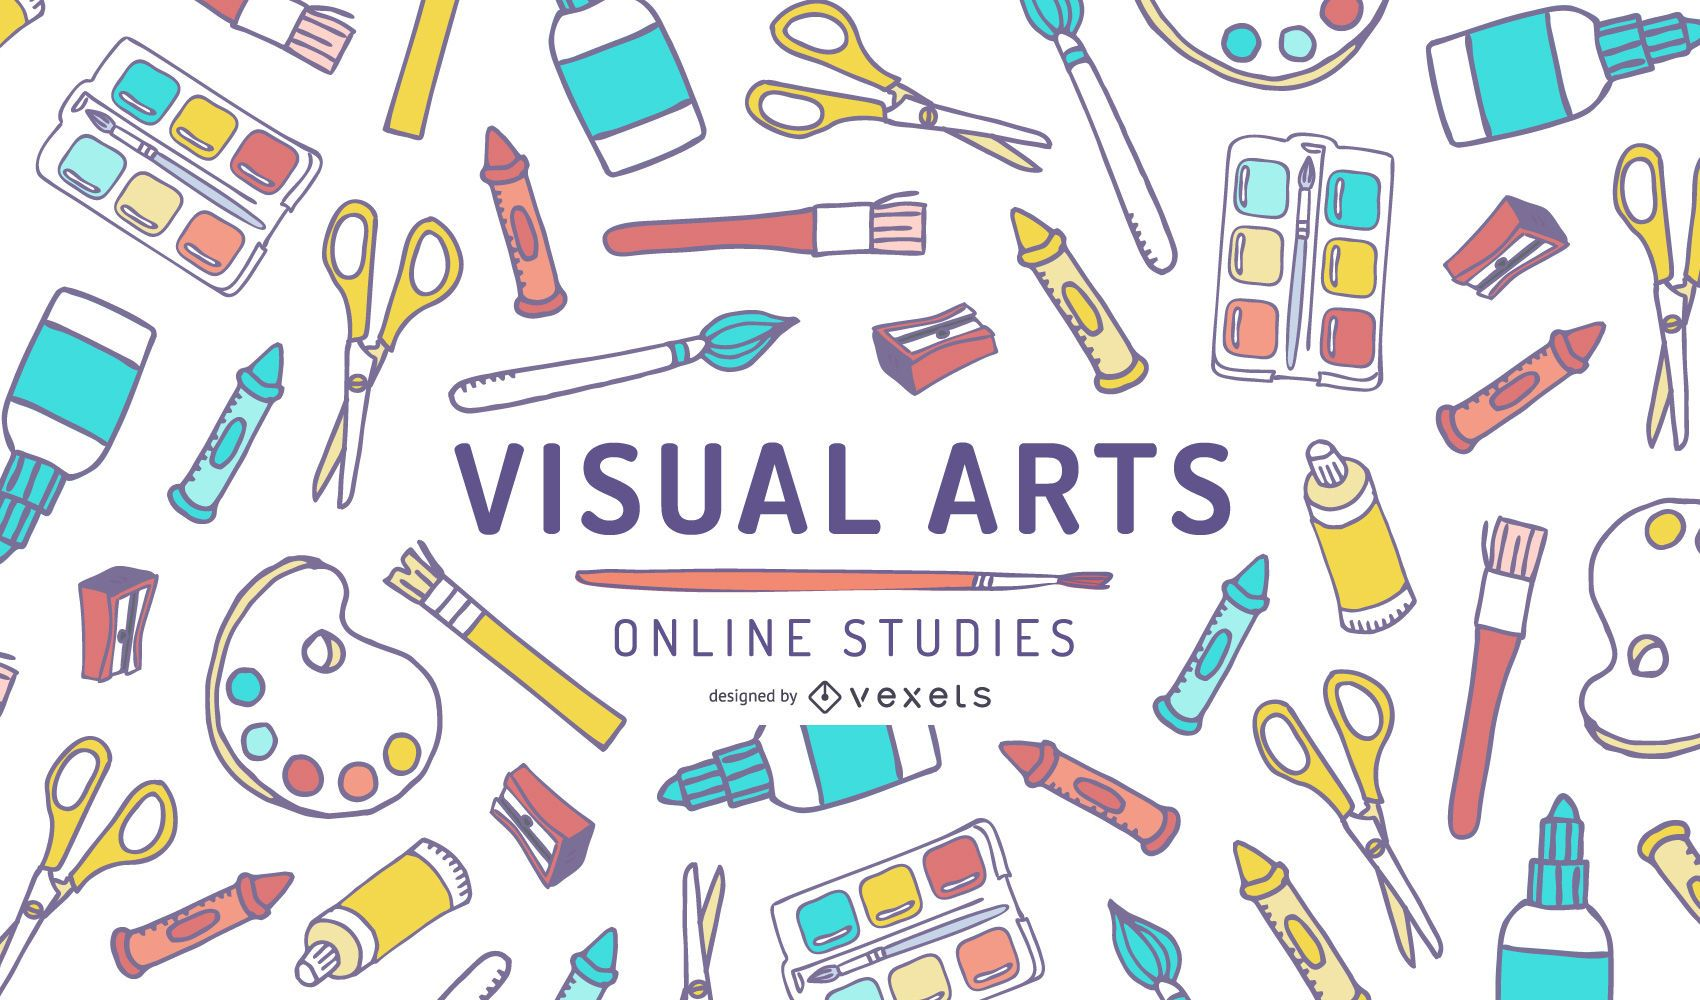 Visual Arts Online Studies Cover Design